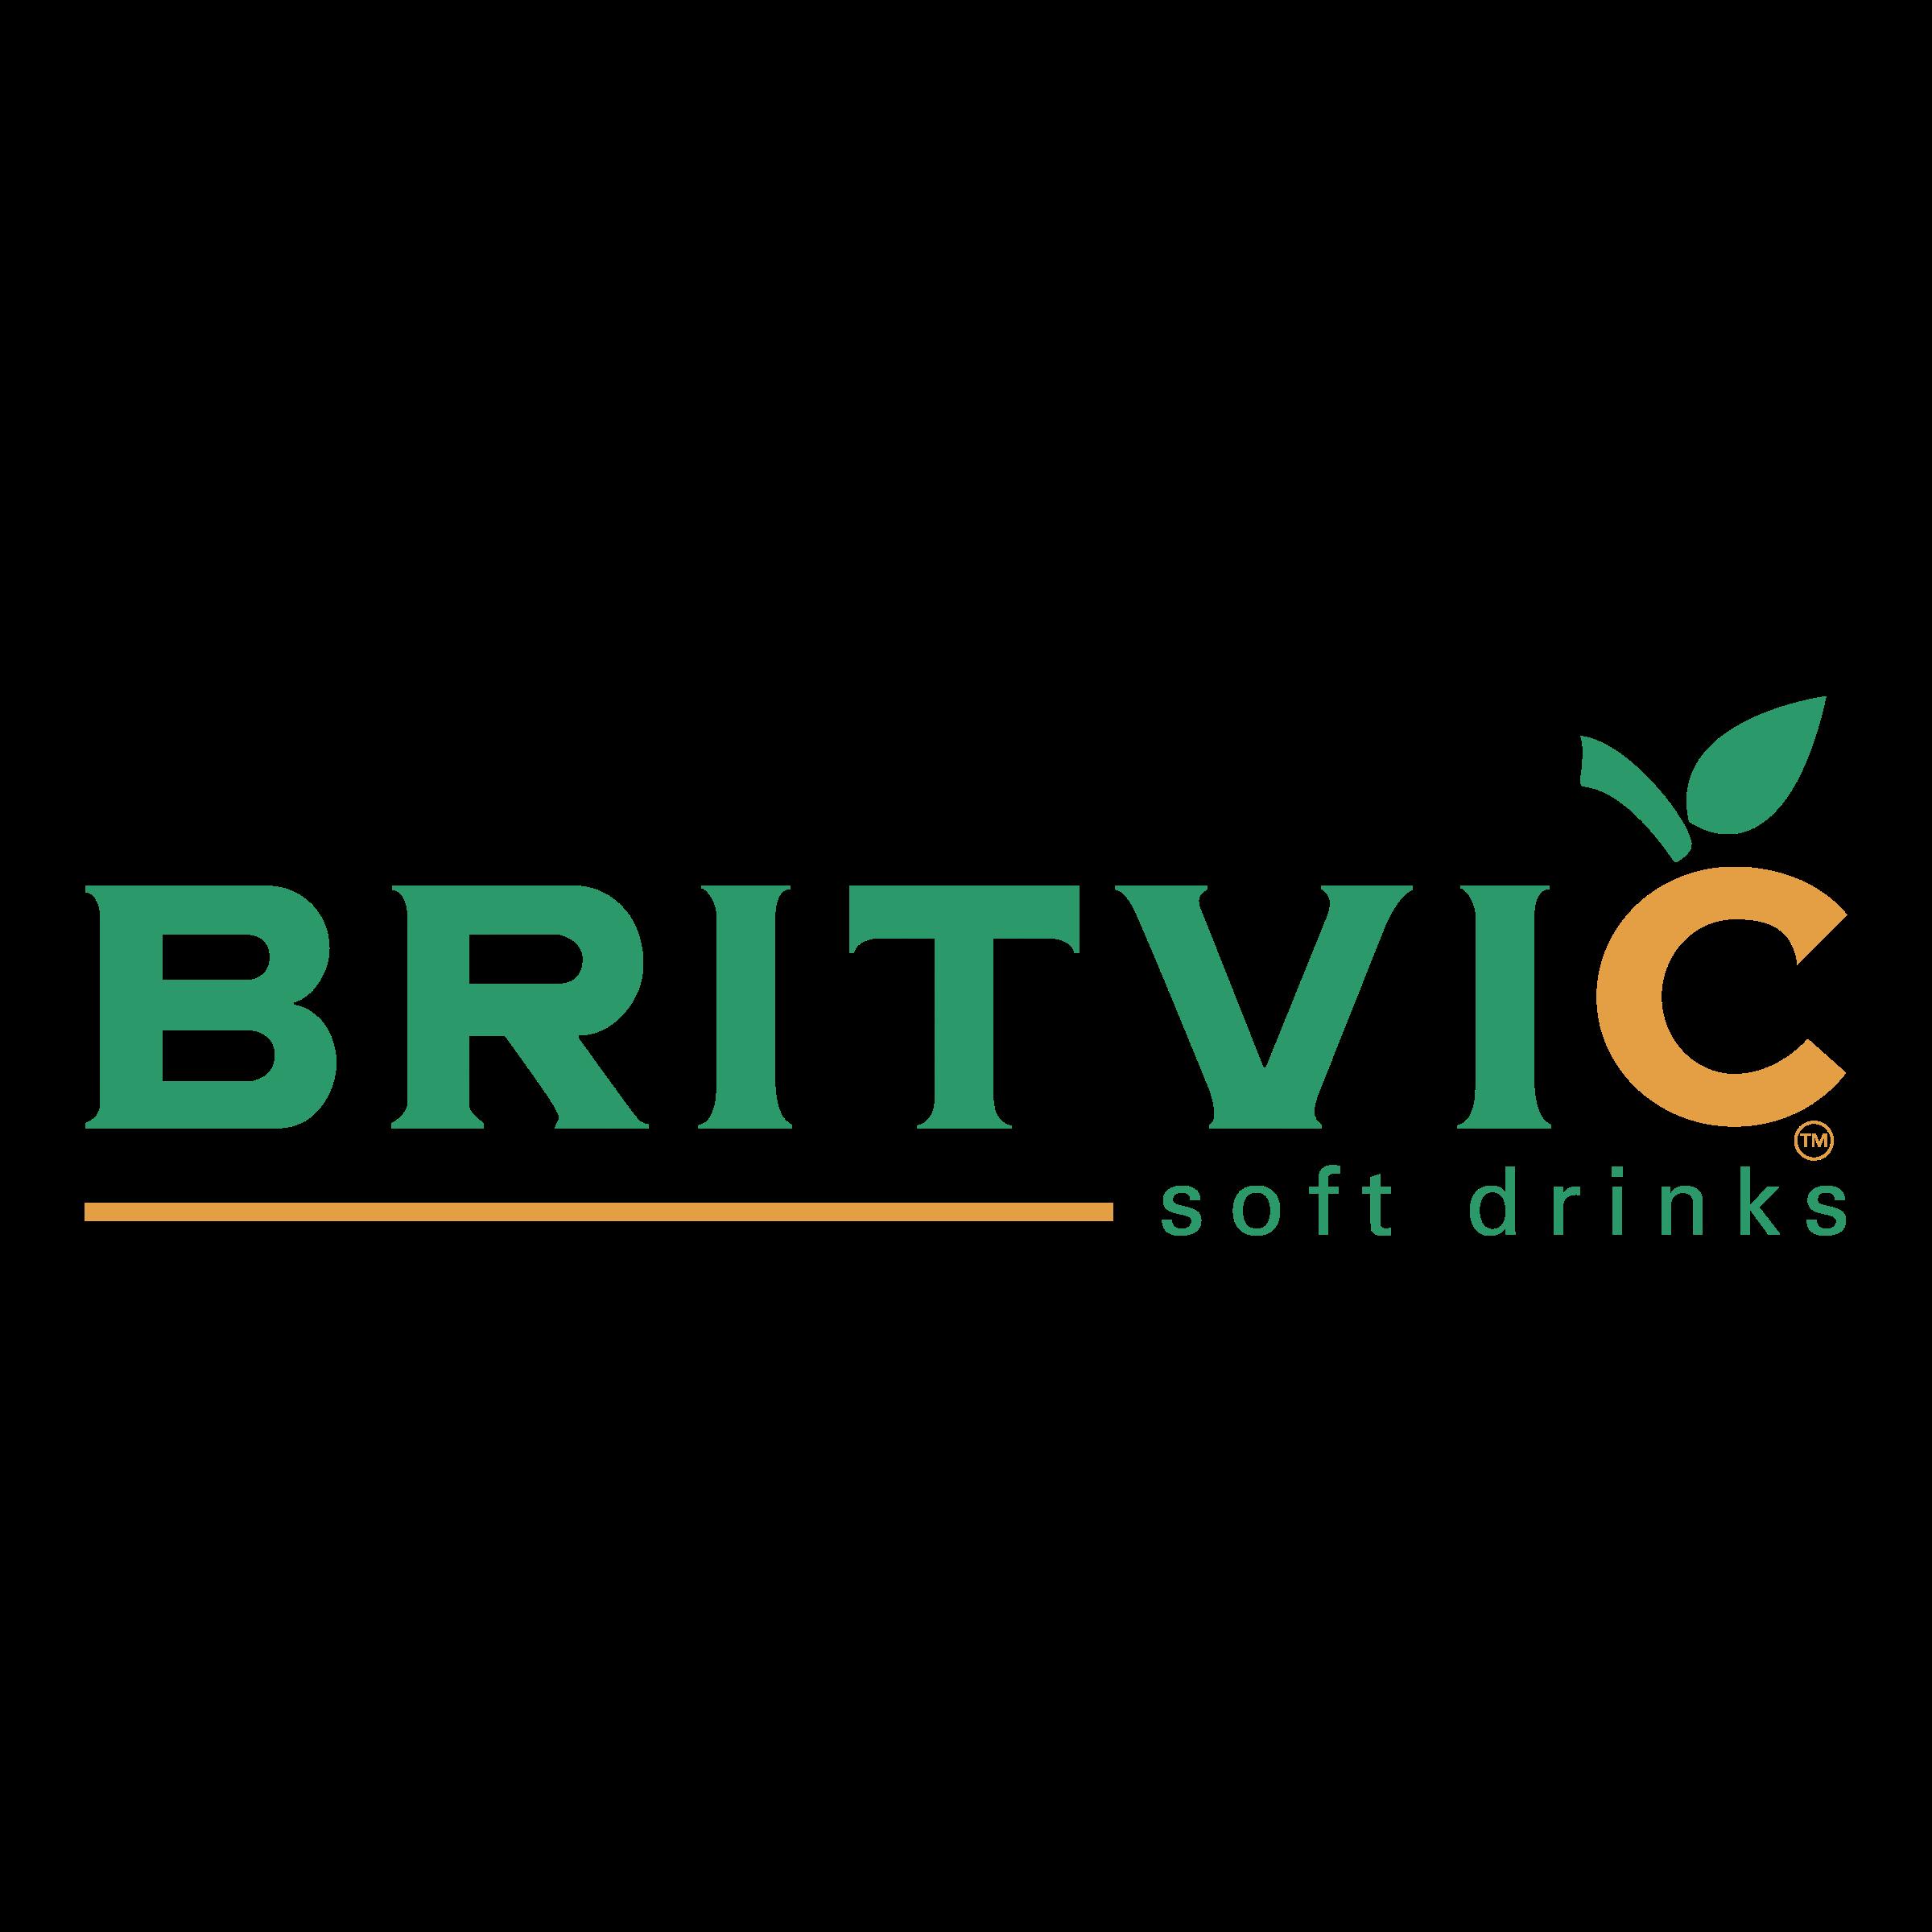 Loge britvic in PNG